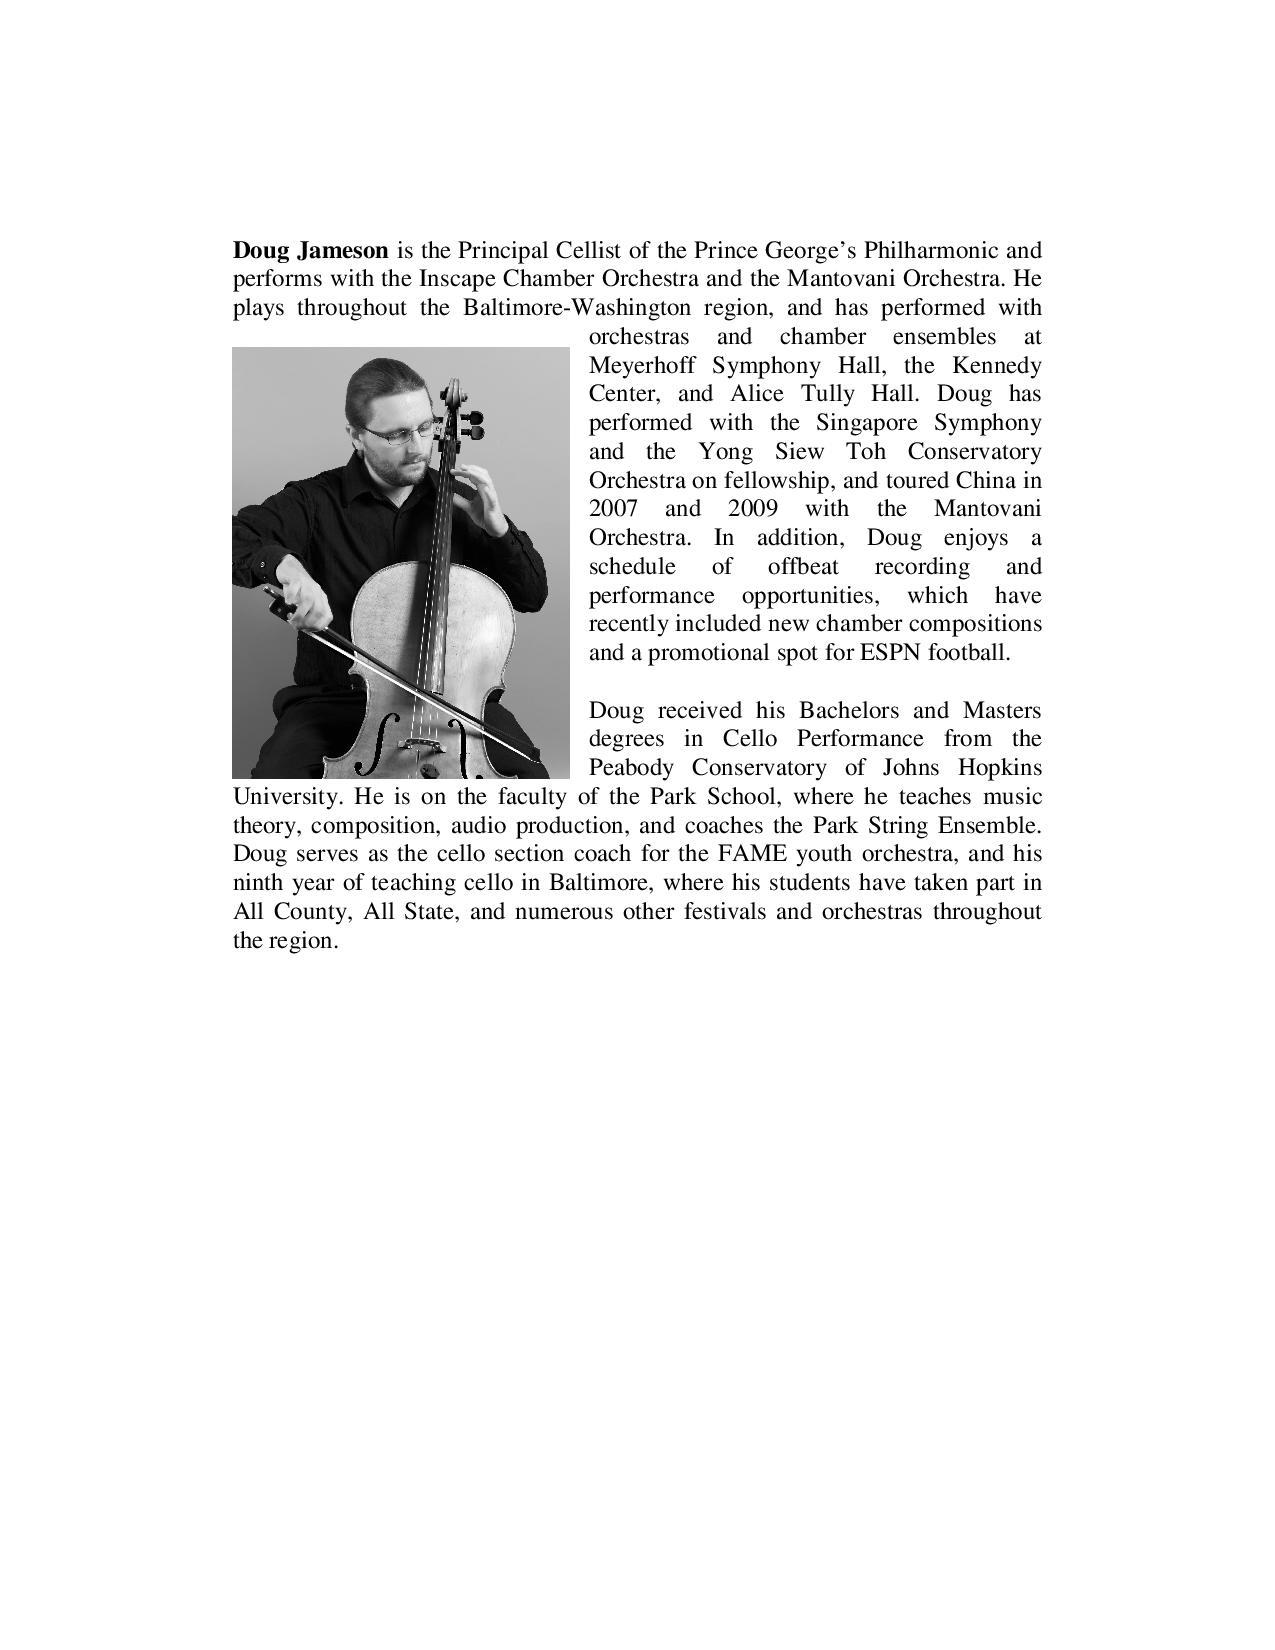 2009-10-25 - Program for Printing-page-006.jpg